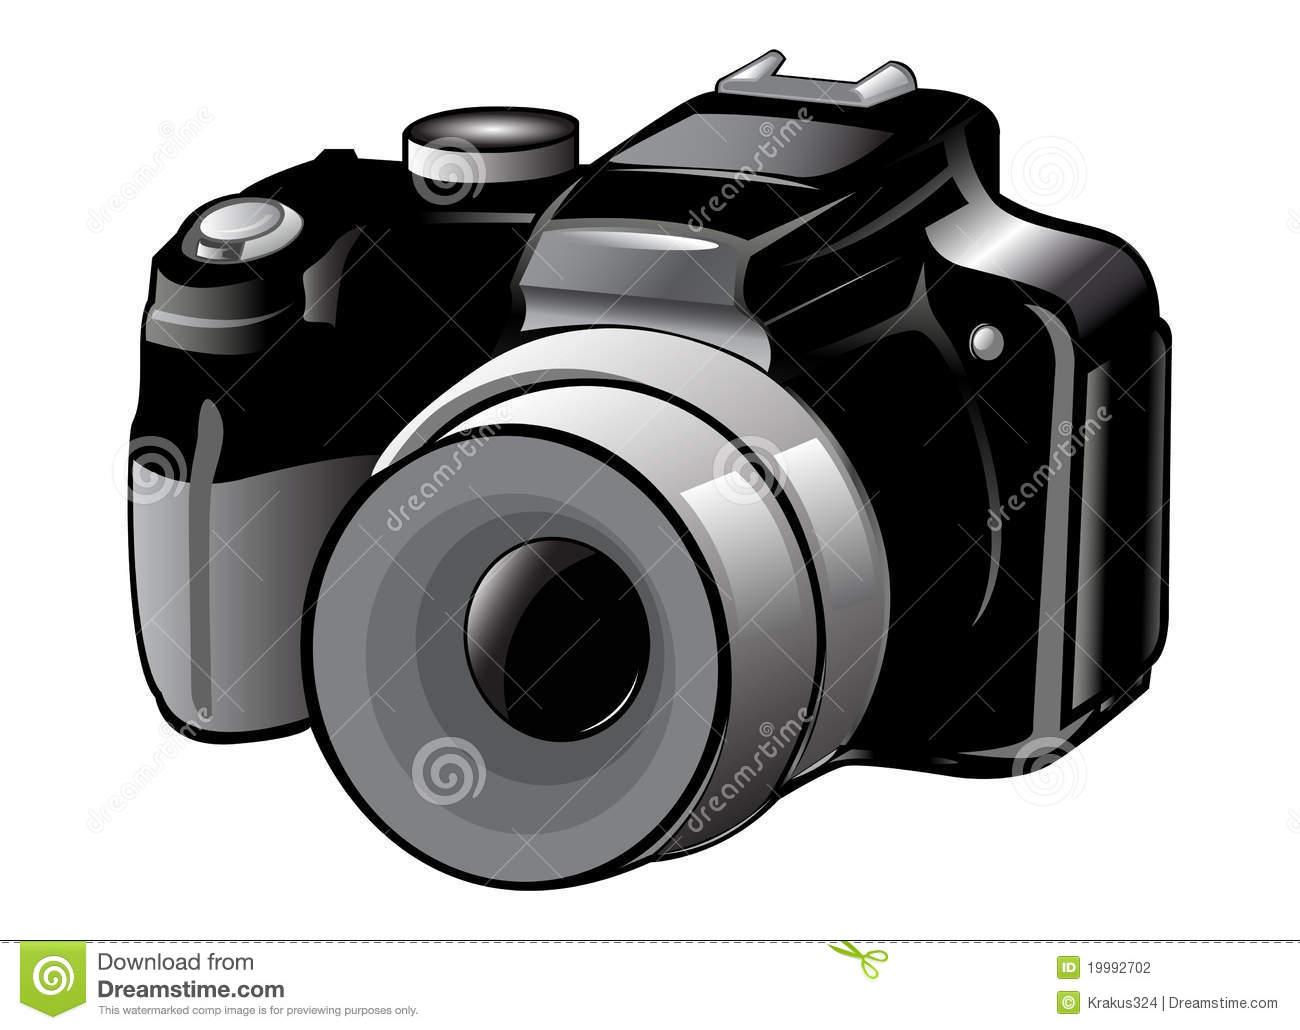 Nikon clipart Nikon #17 Nikon drawings clipart